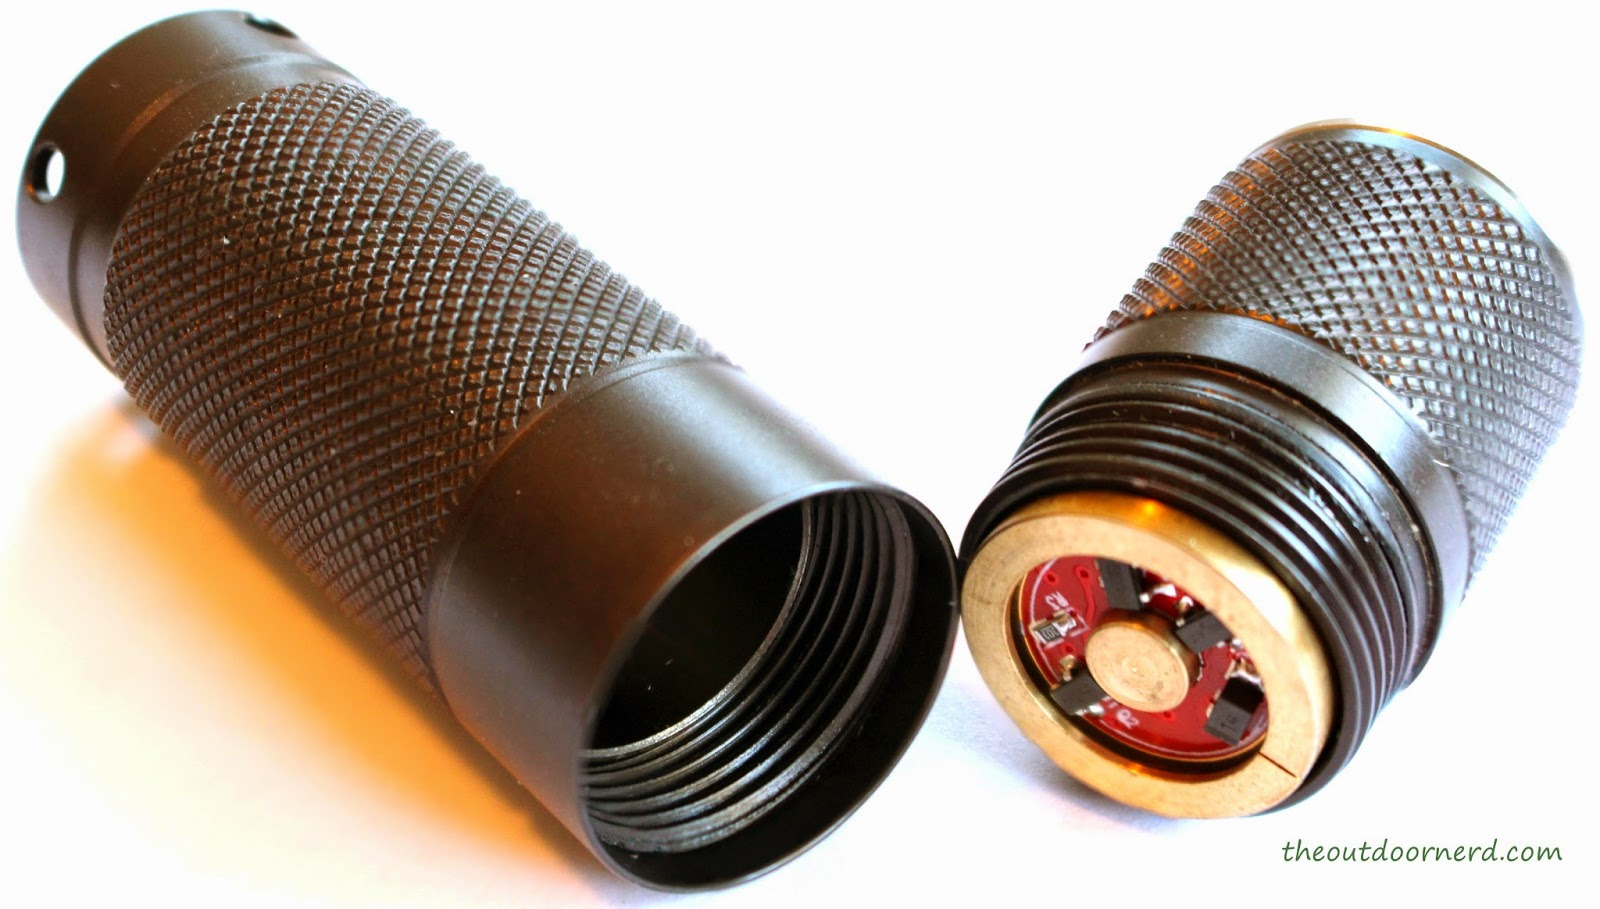 Nitecore Ex10 1xCR123A Flashlight : Head Removed